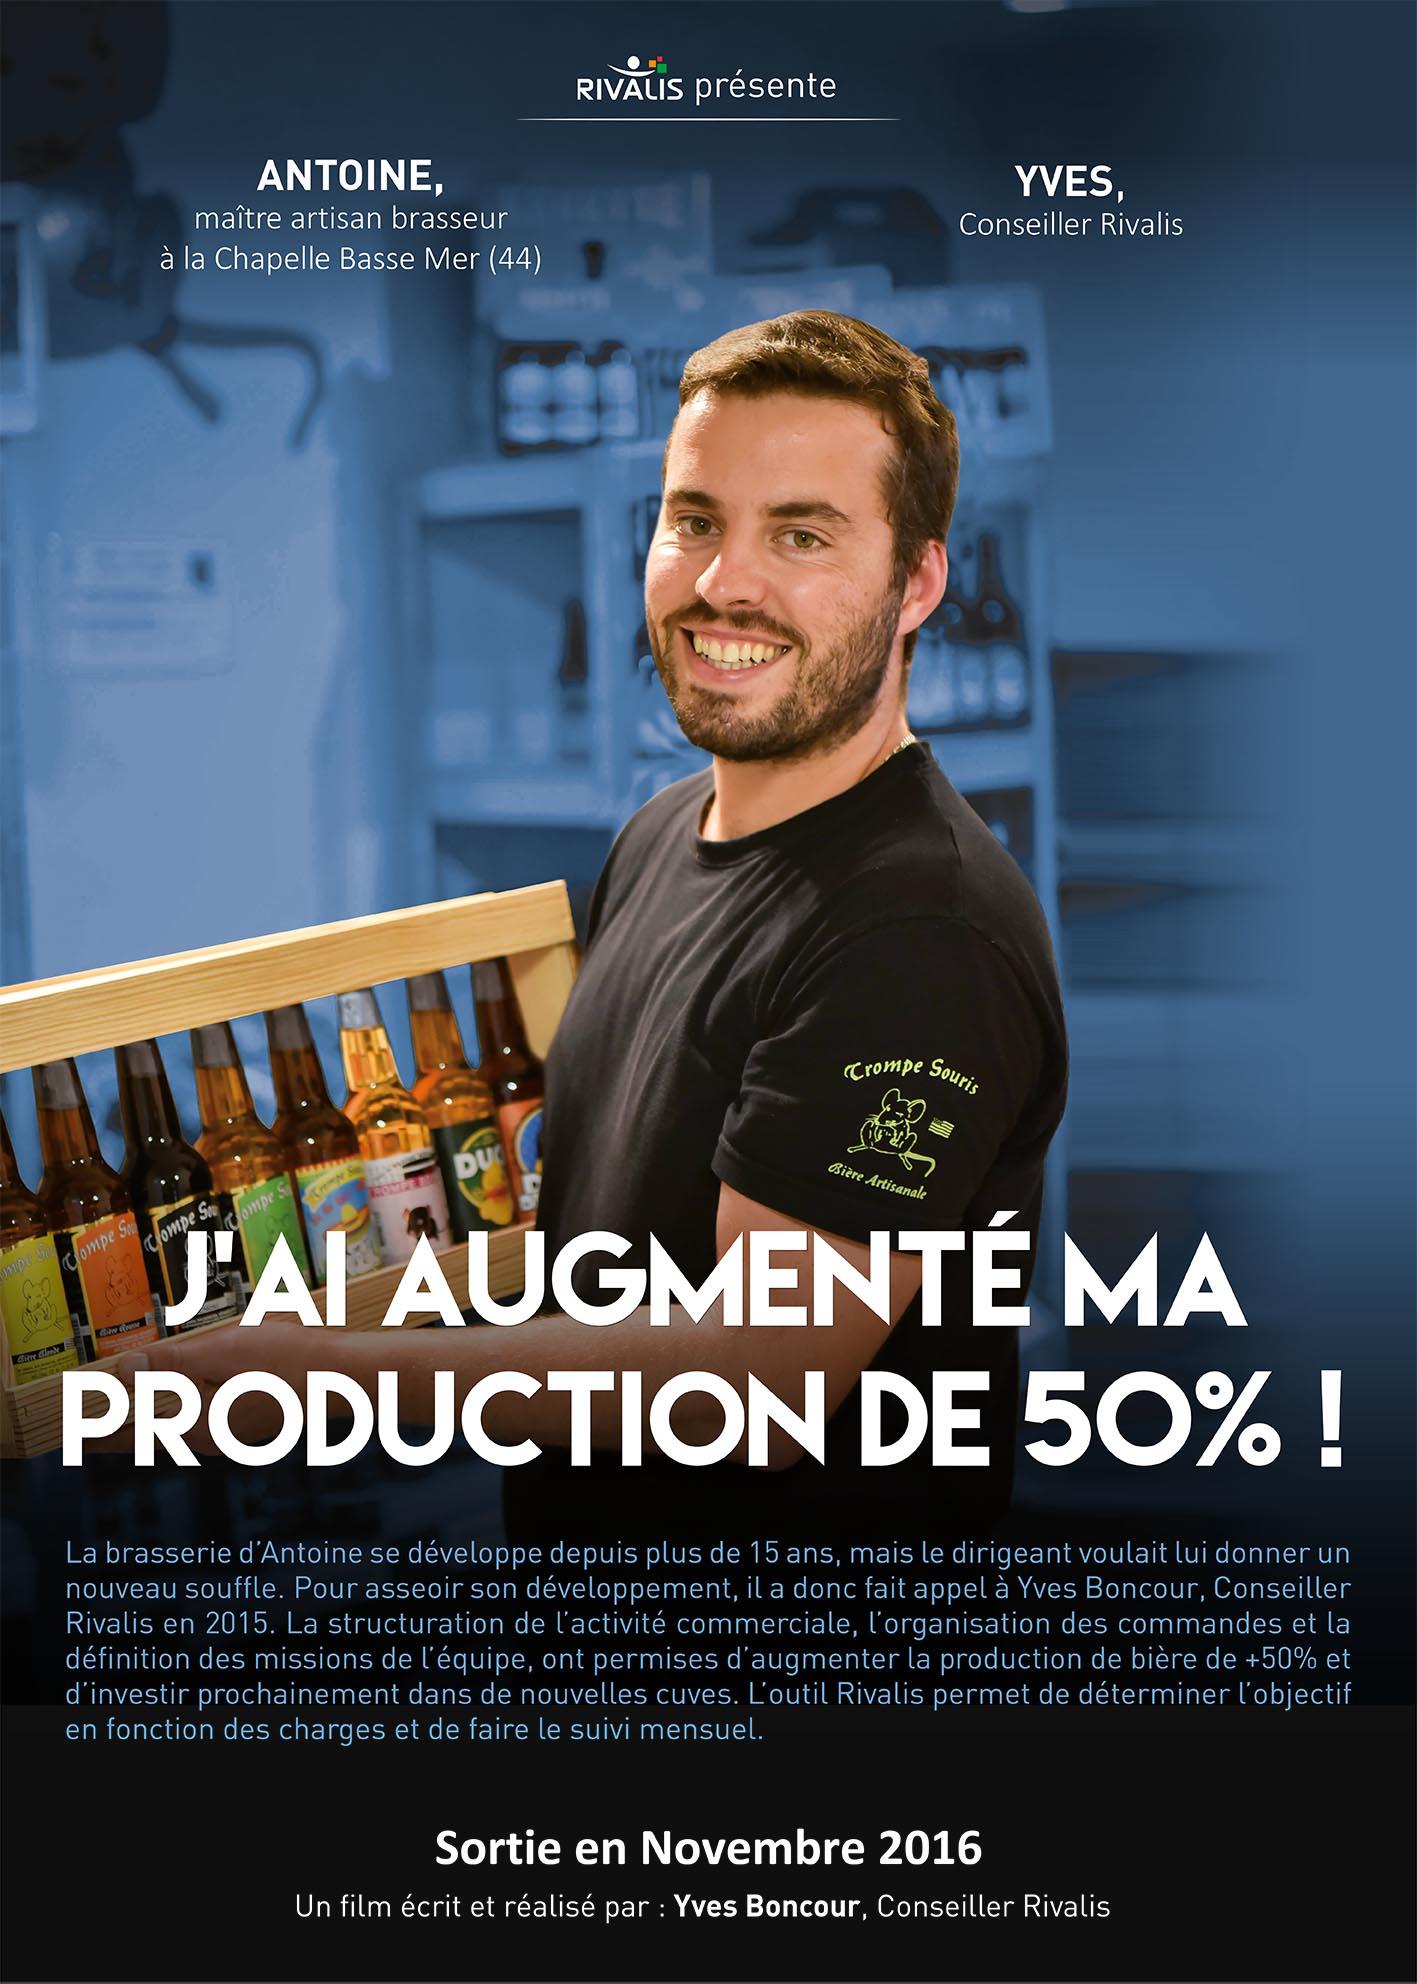 Antoine, brasseur